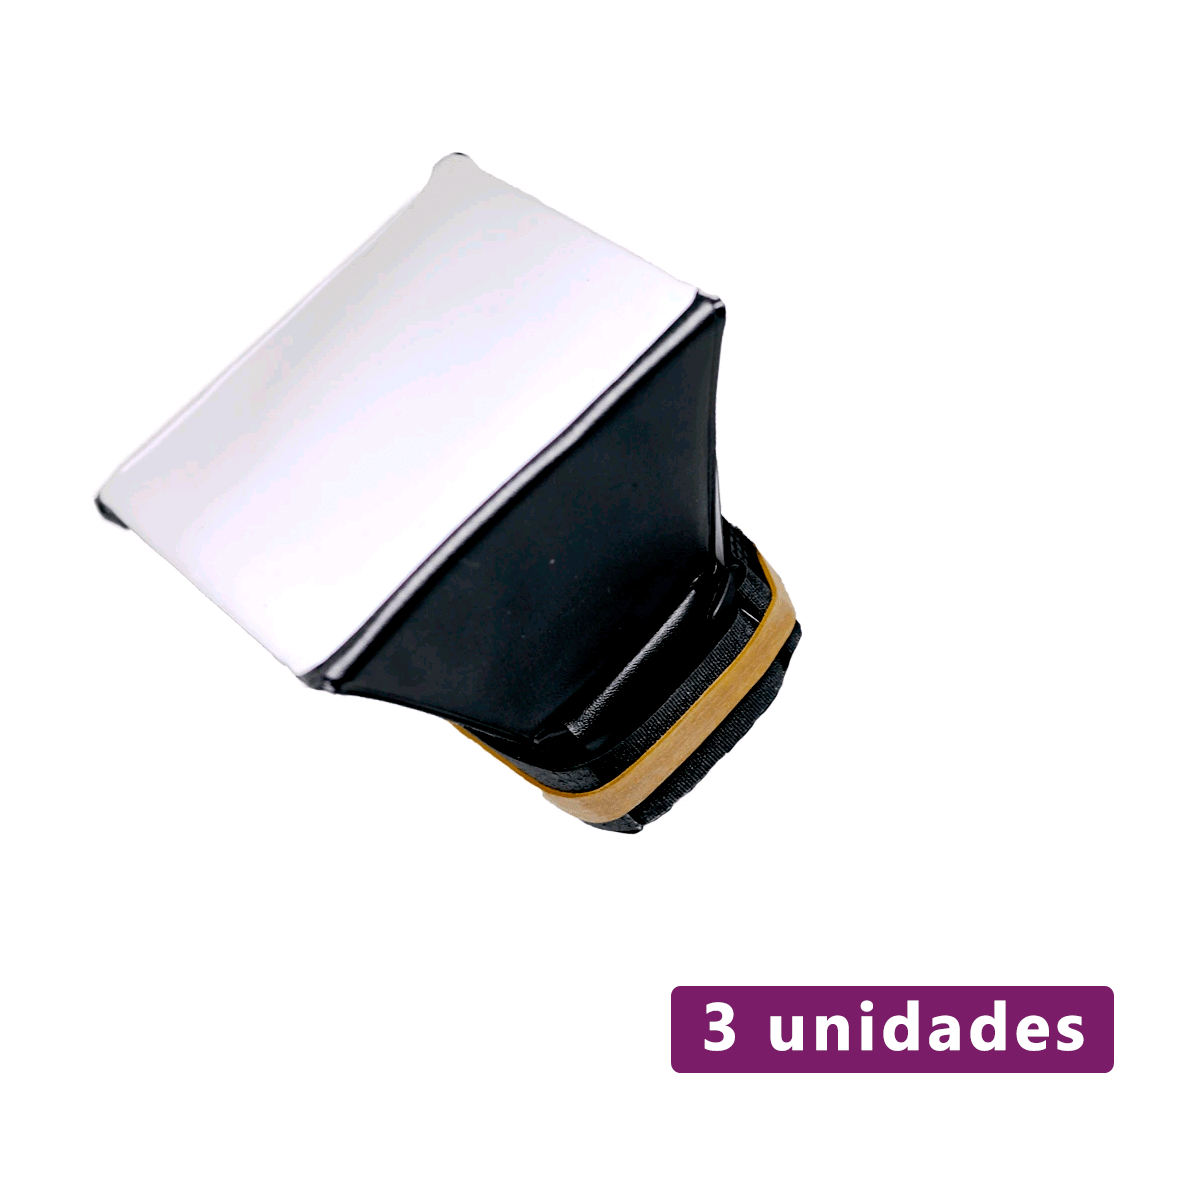 Lote com 3 unidades de Mini Softbox Difusor para Flash Speedlite Sou Foto MSF-001  - Fotolux